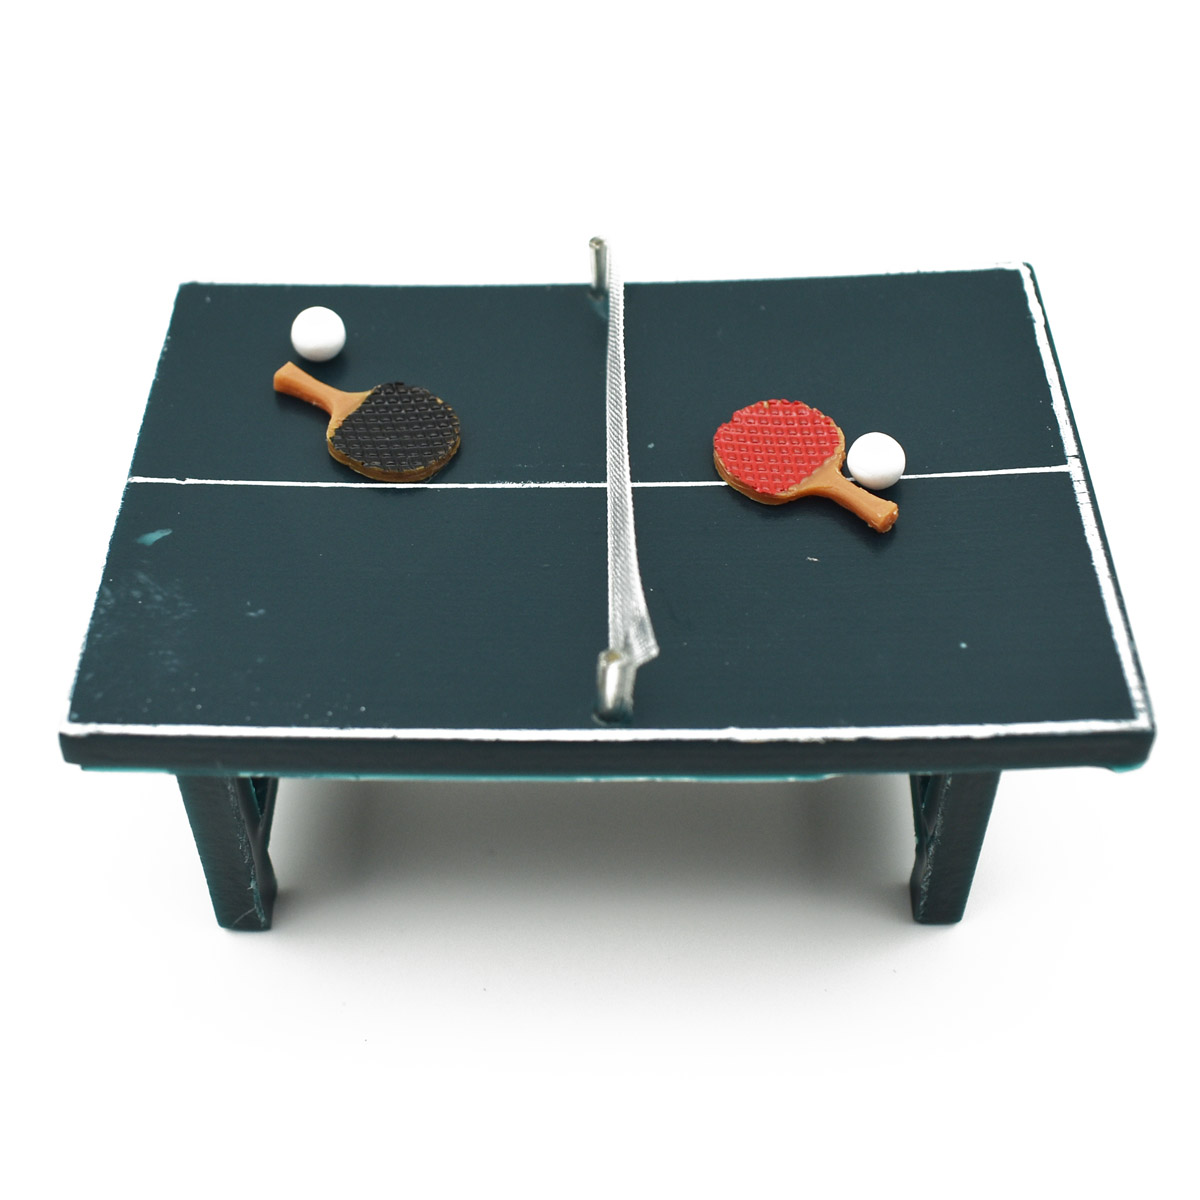 5e33a6f40 75 50mm Mini Ping-pong Table   Table Tennis Bats Dollhouse Furniture ...